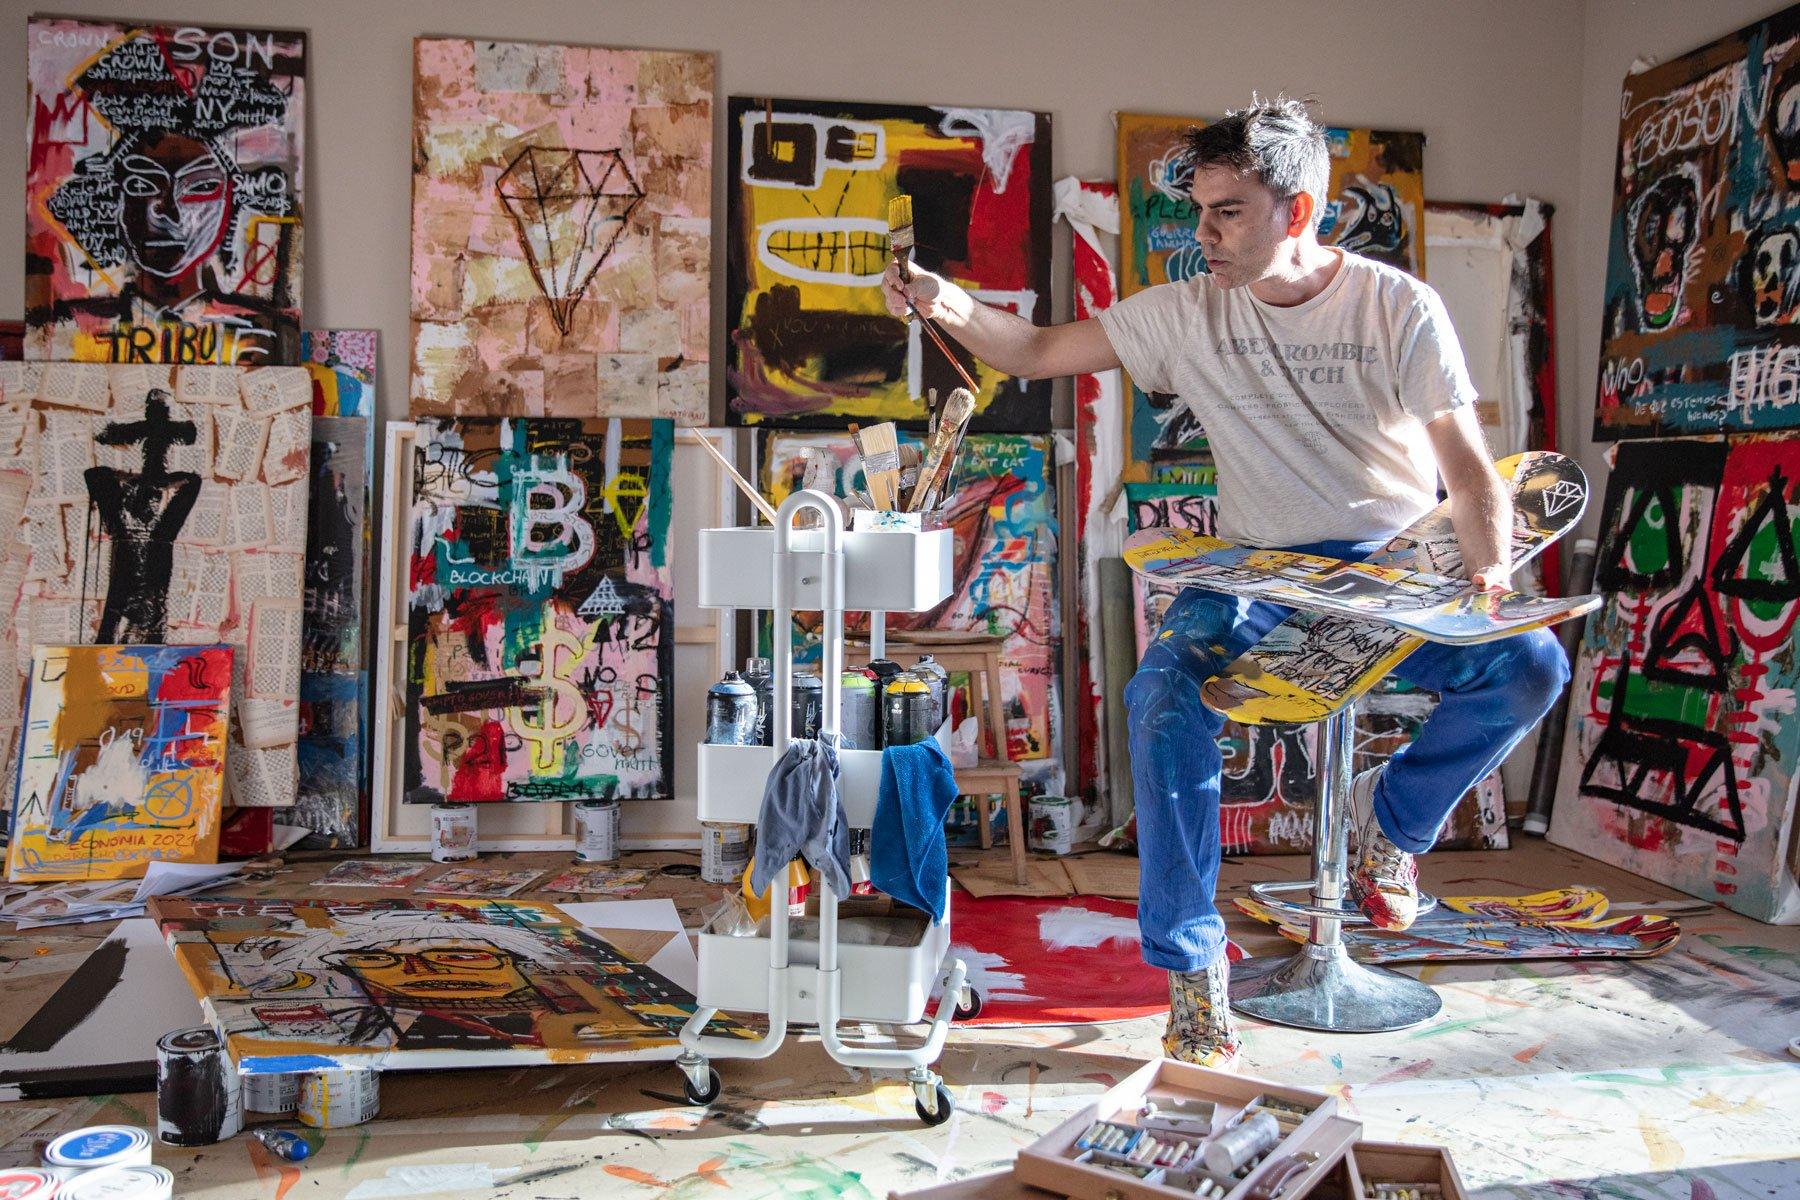 Diego Tirigall, Street Artist panting on skate board decks